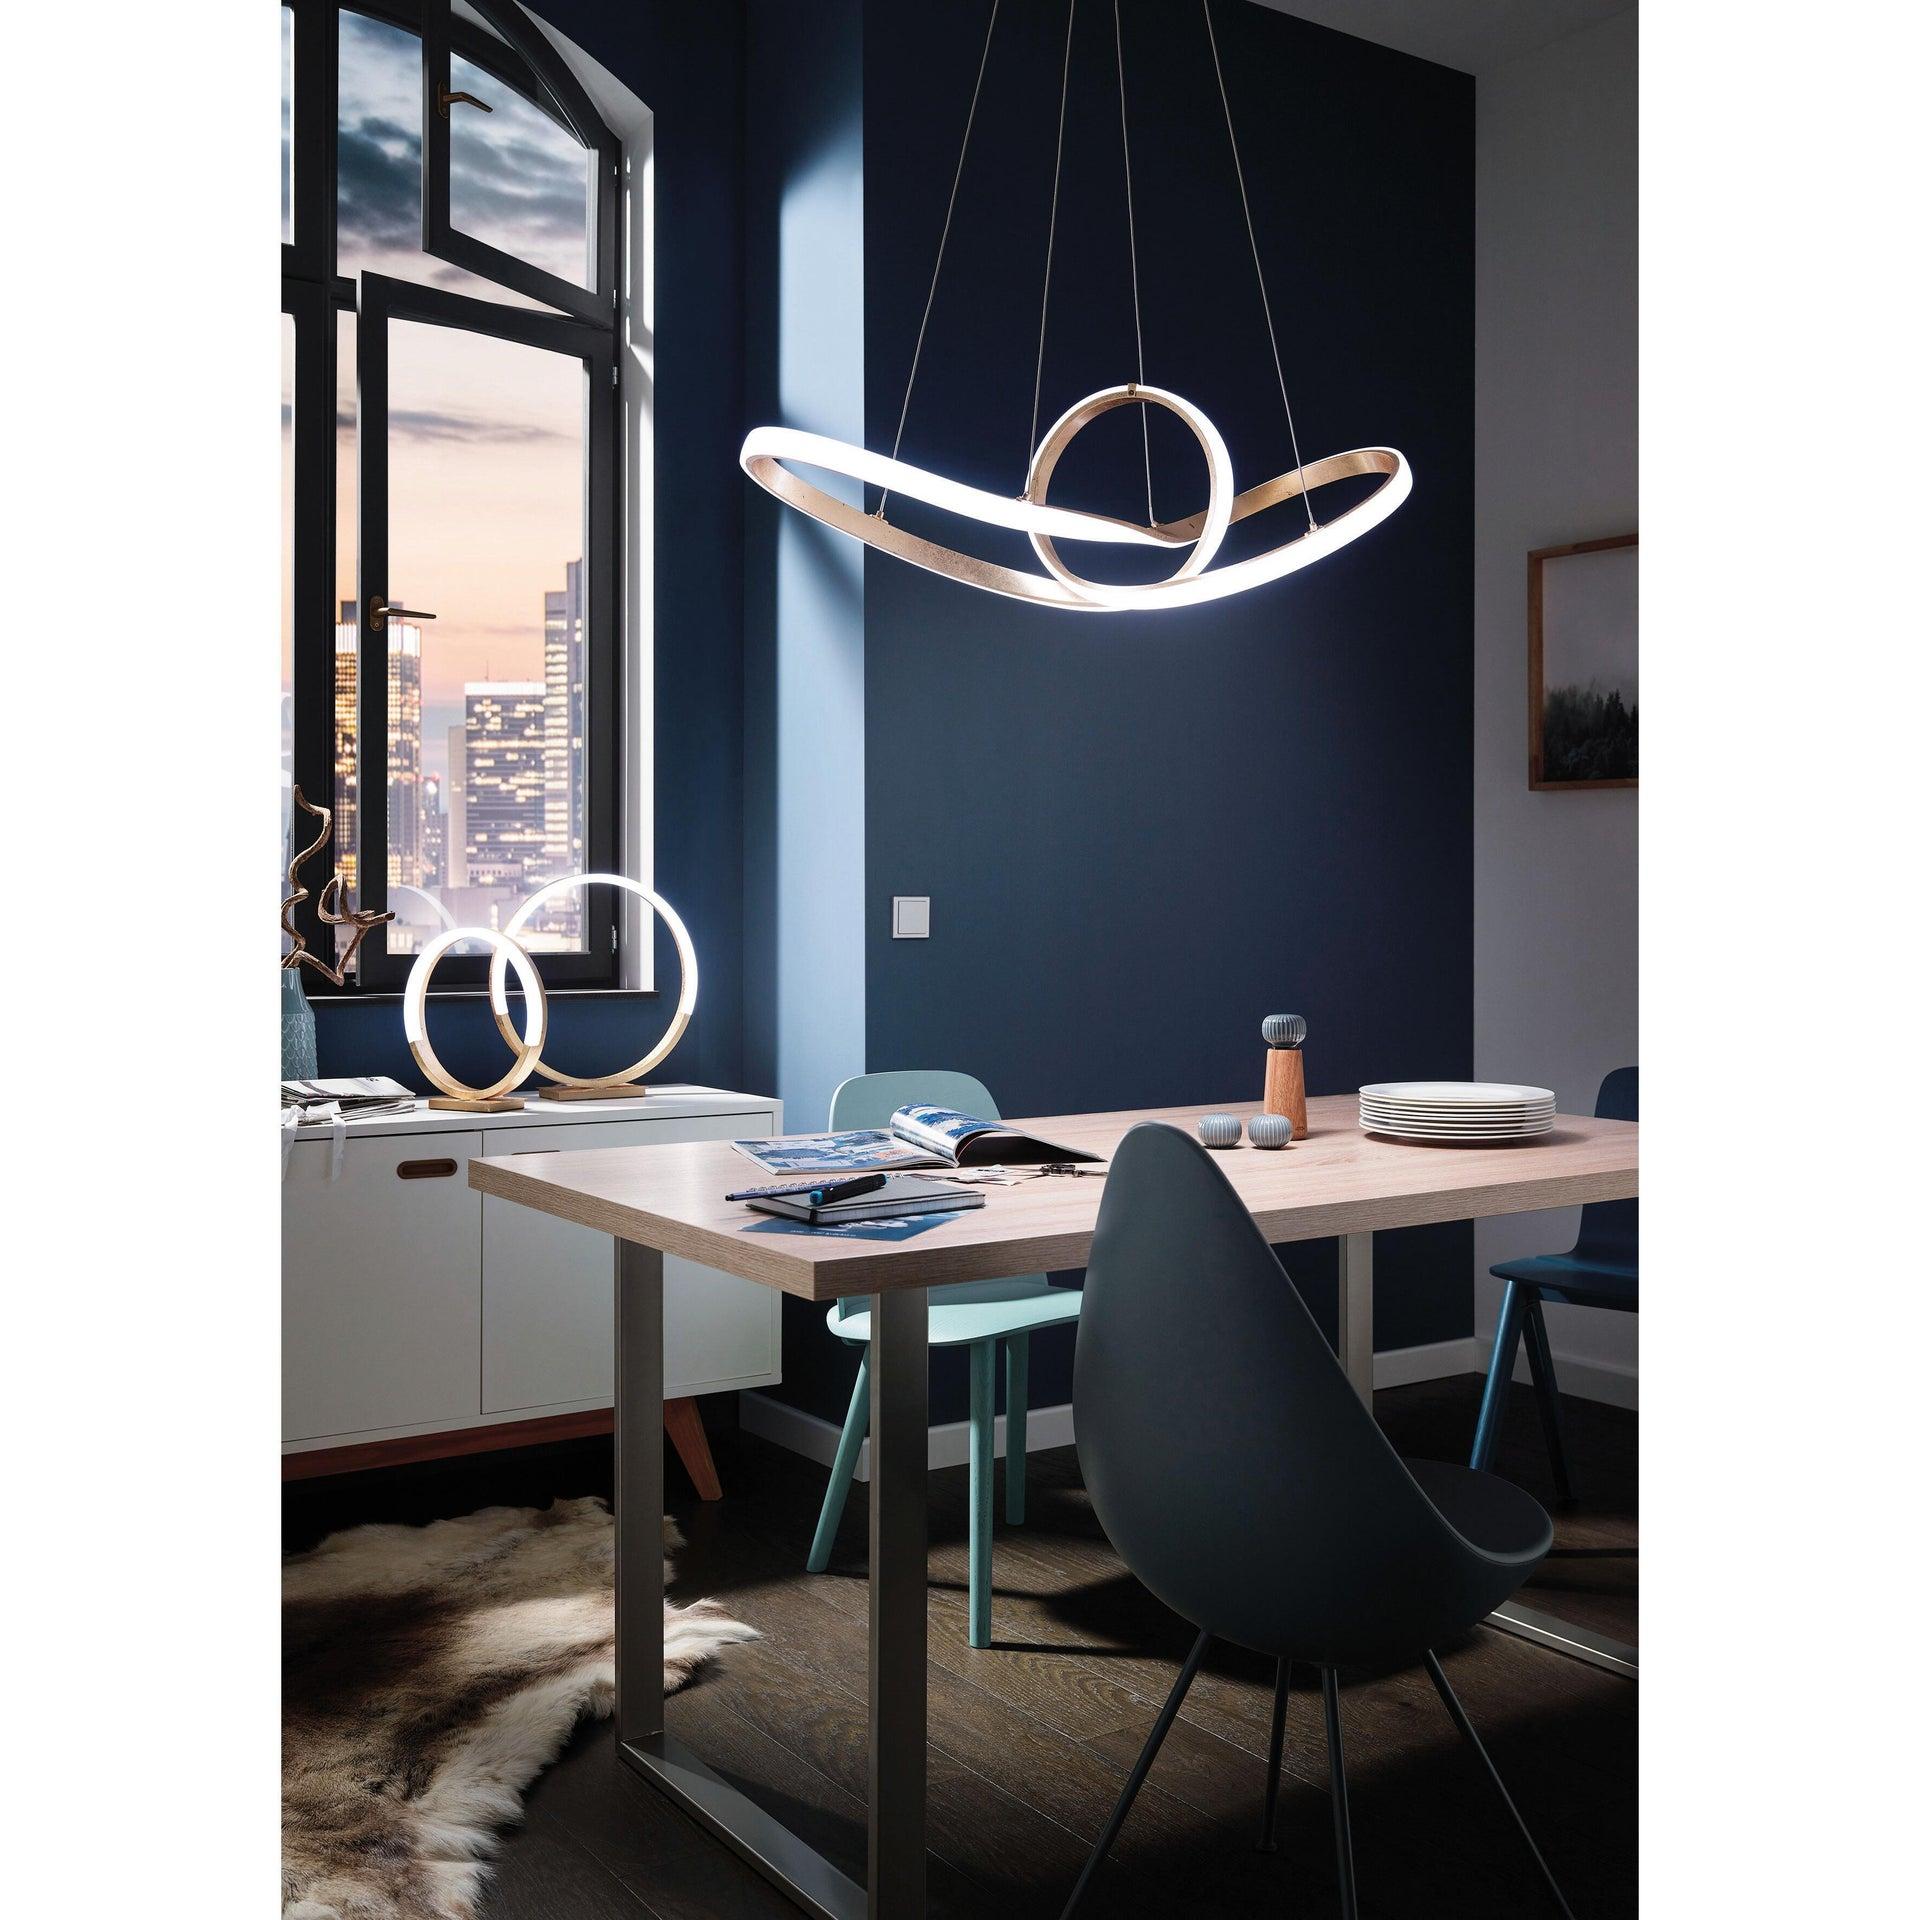 Lampadario Glamour Missoni LED integrato oro, in metallo, D. 92 cm, L. 92 cm, ACTION - 1